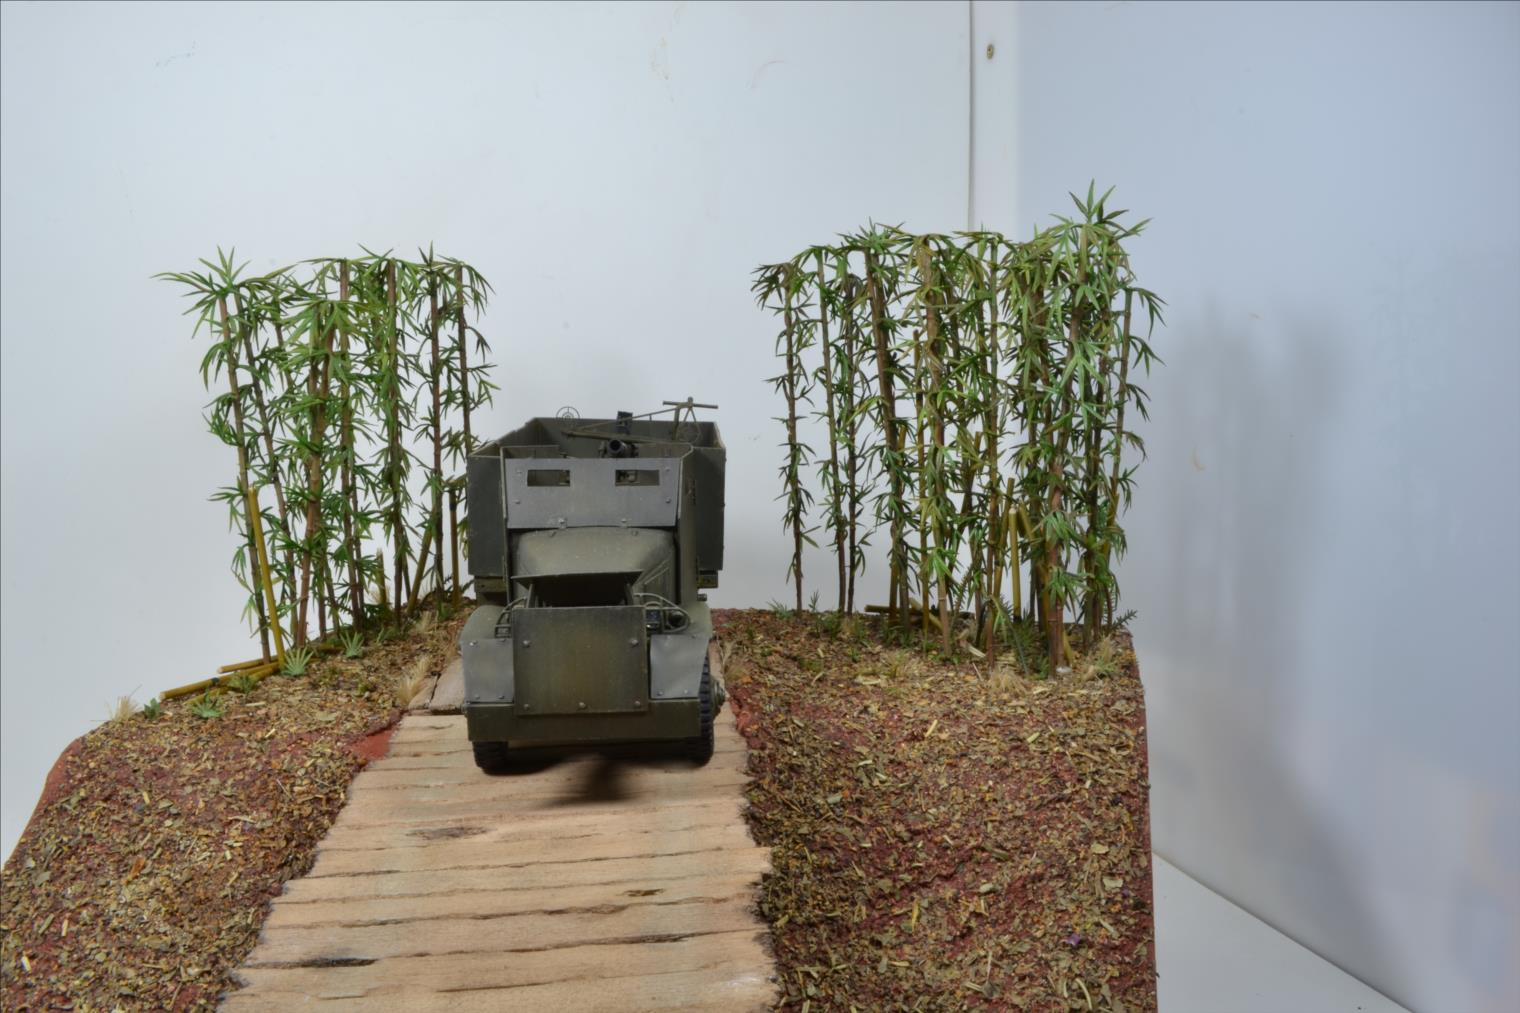 INDOCHINE GMC Bofors (Hobby Boss) 1/35 - Page 3 19122908493822494216576194